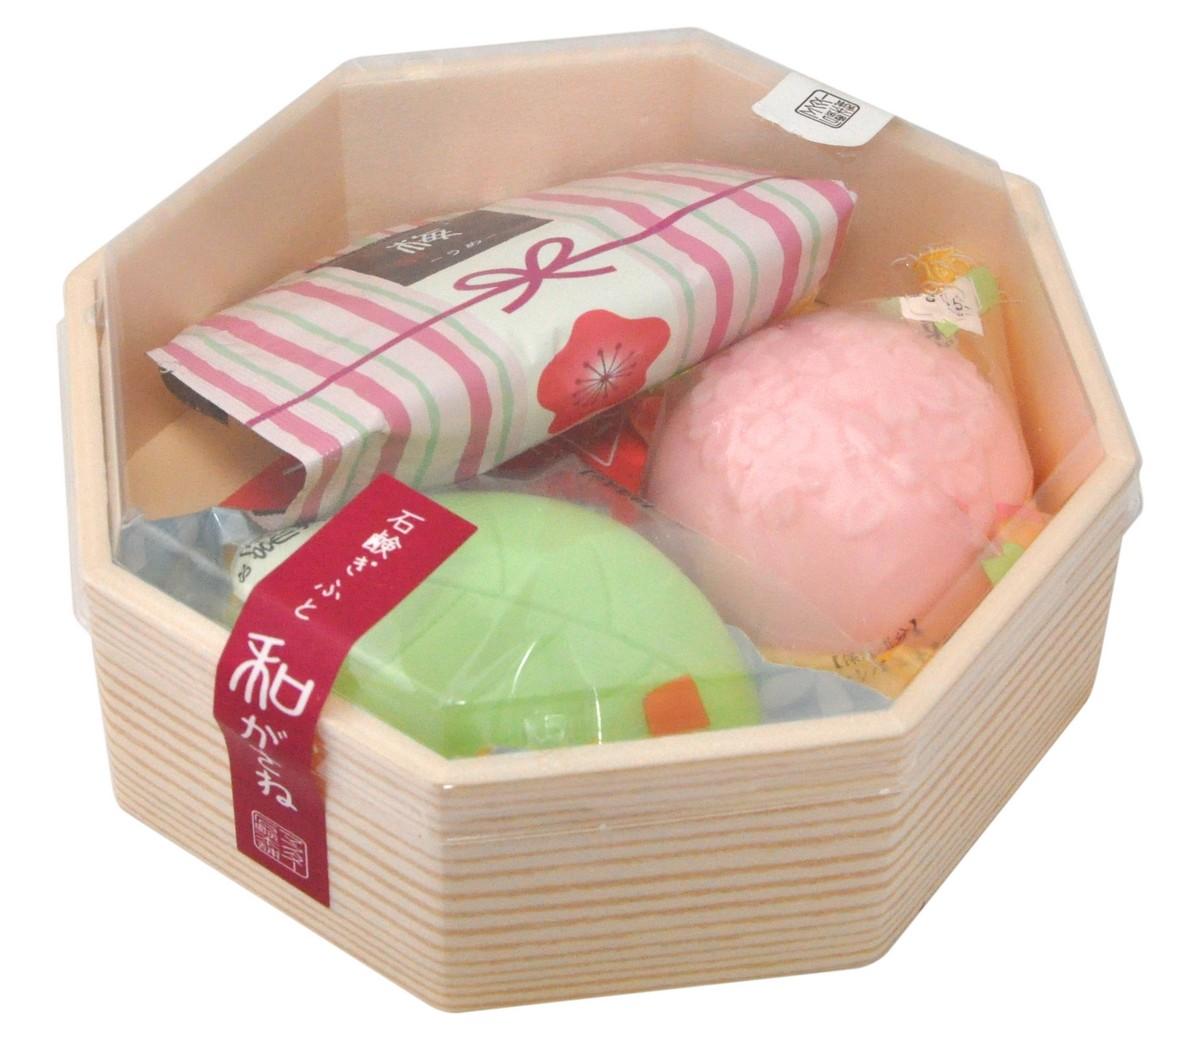 "Мыло туалетное / Подарочный набор ""Цветы и травы"" (50g*2 25g*1) арт. 108735"